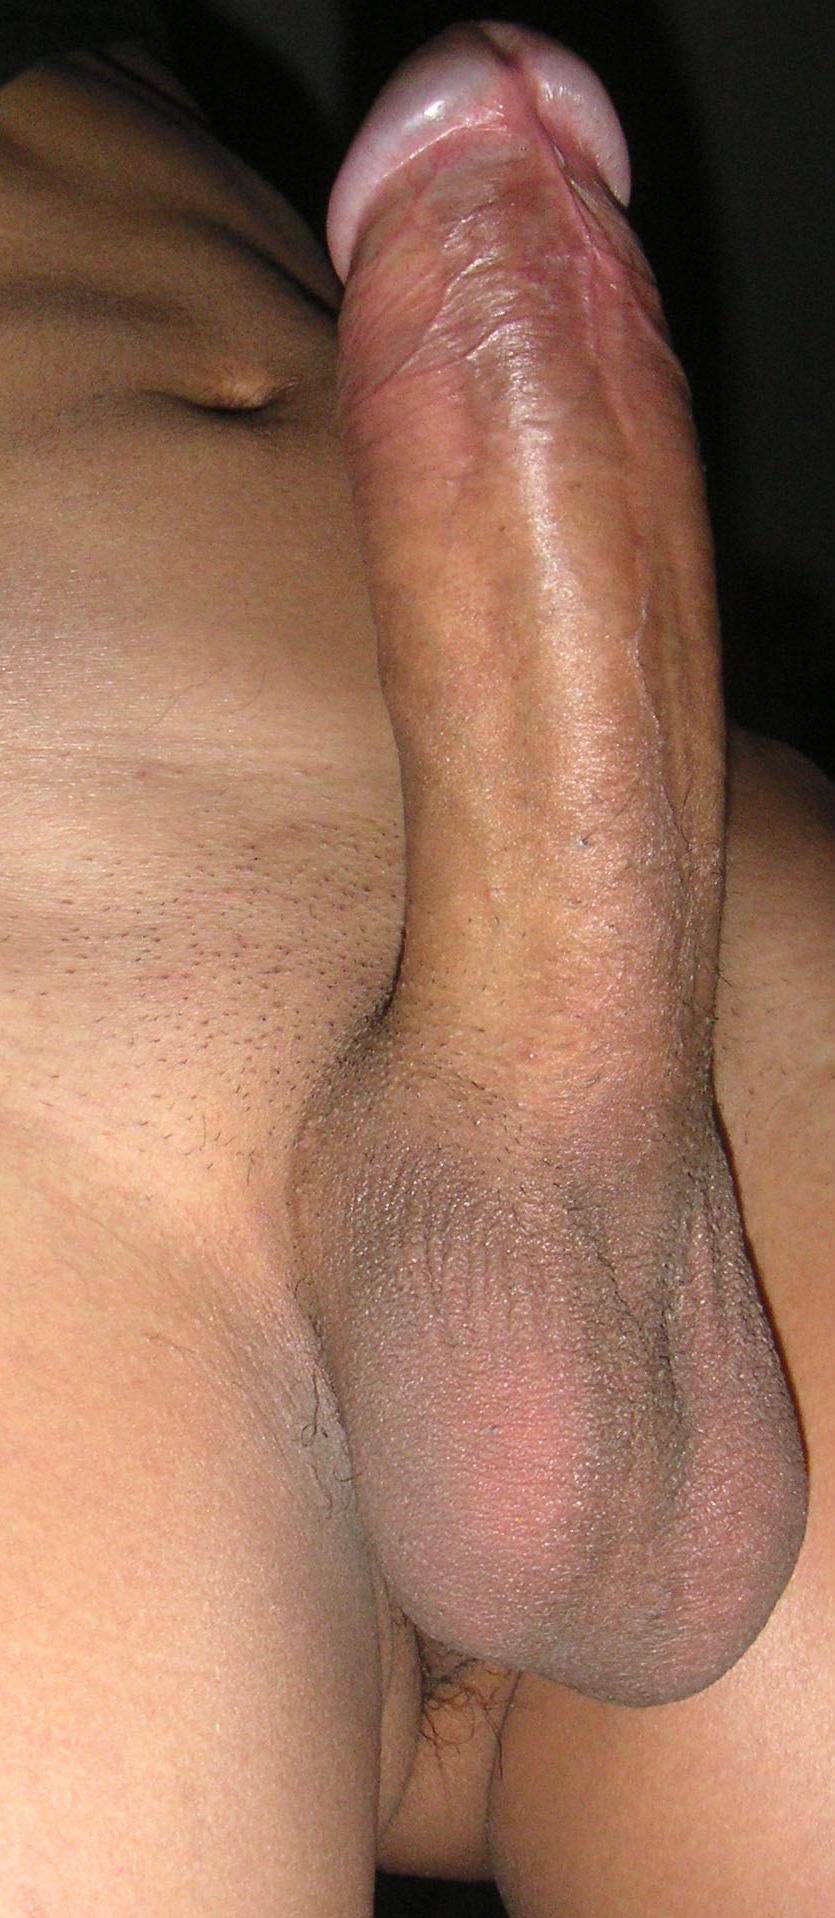 Normal dick porn